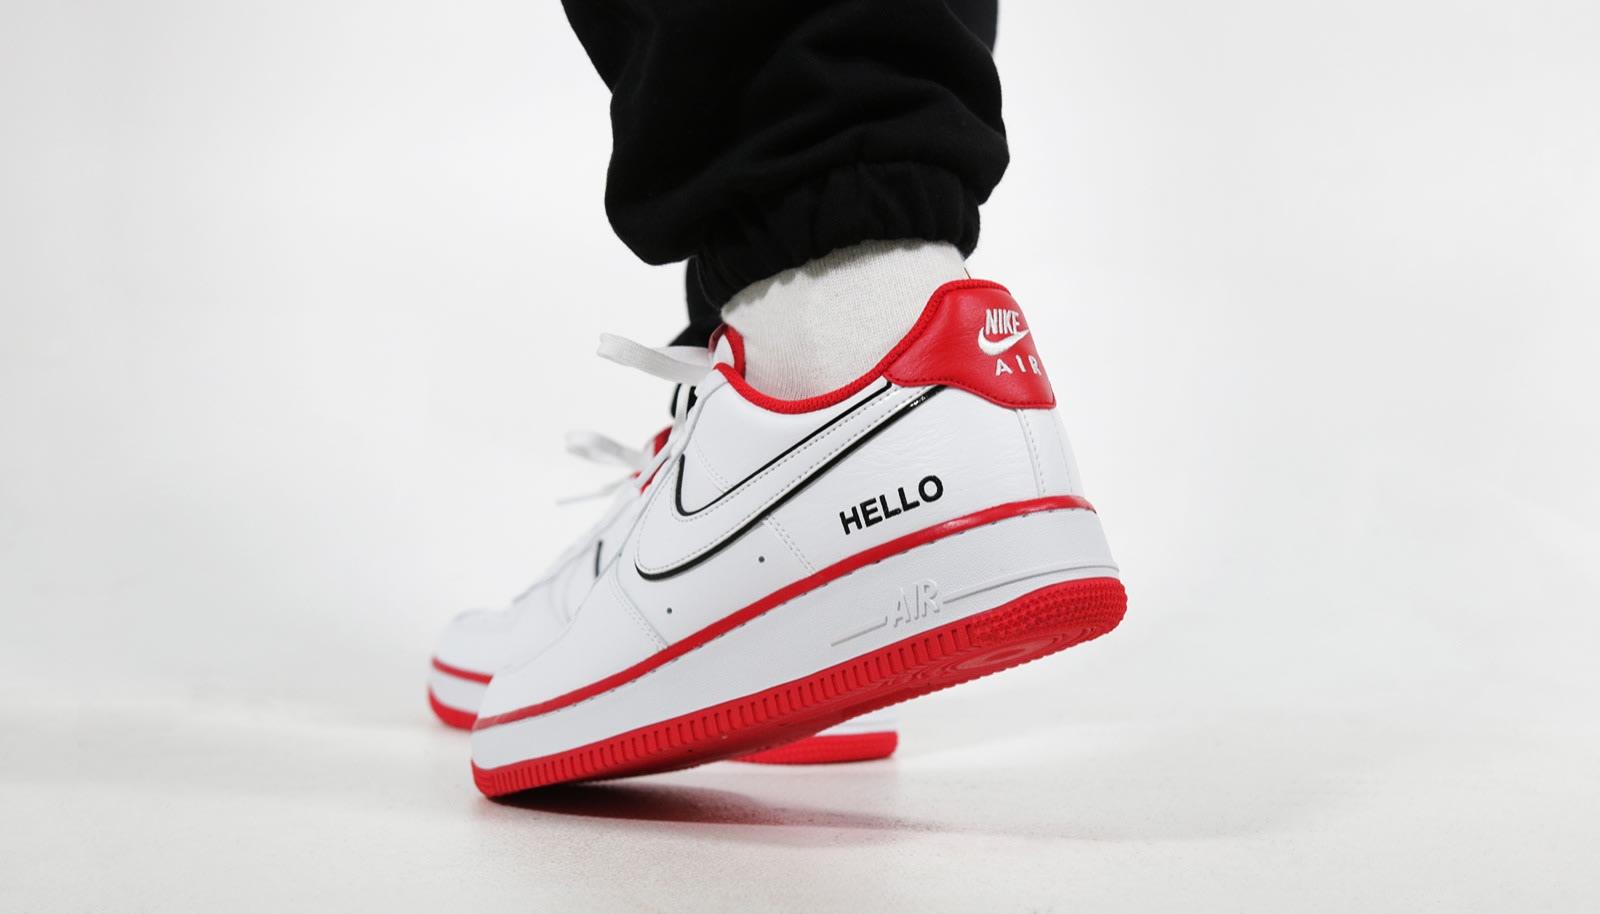 Nike Air Force 1 'Hello'